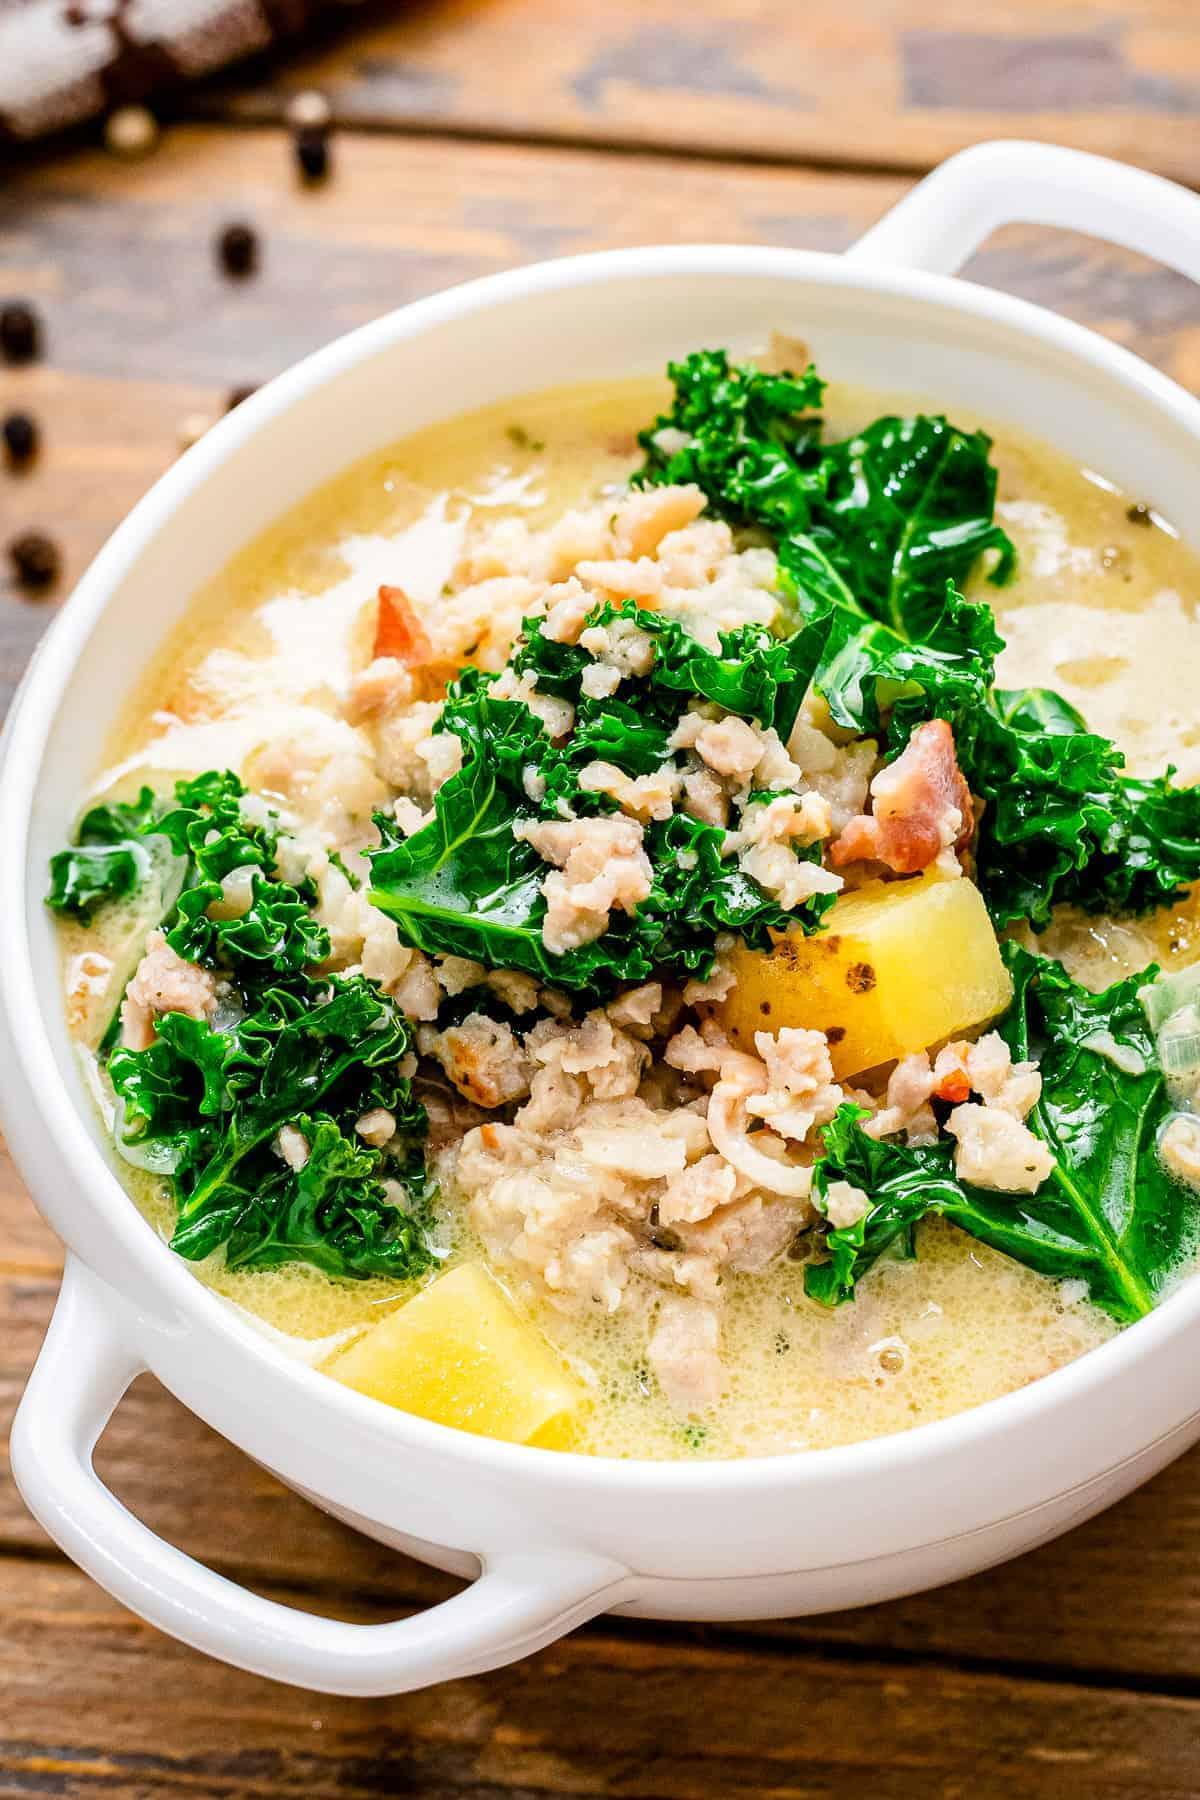 White bowl with Crock Pot Zuppa Toscana